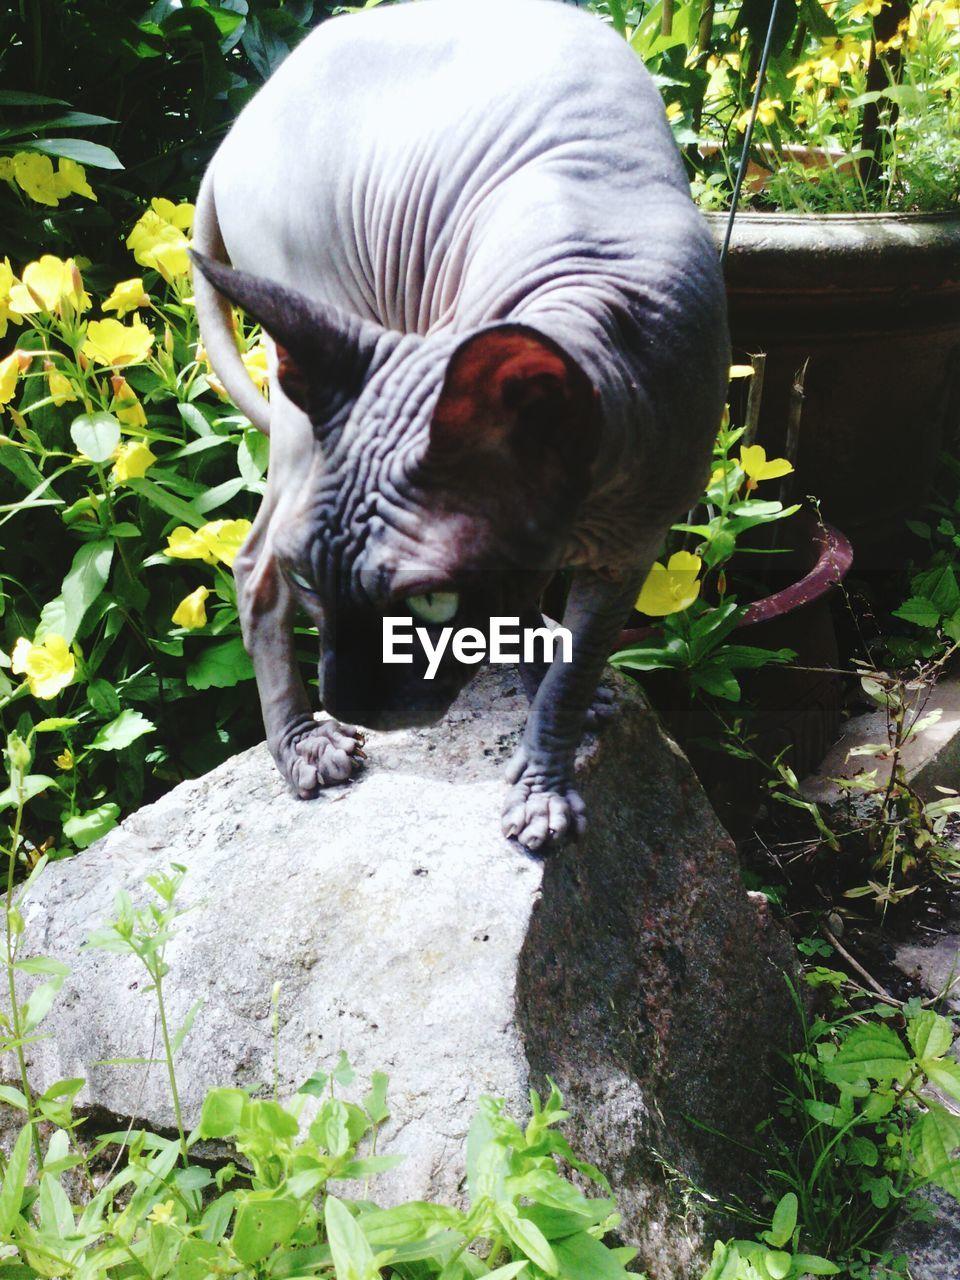 Sphynx Hairless Cat On Rock